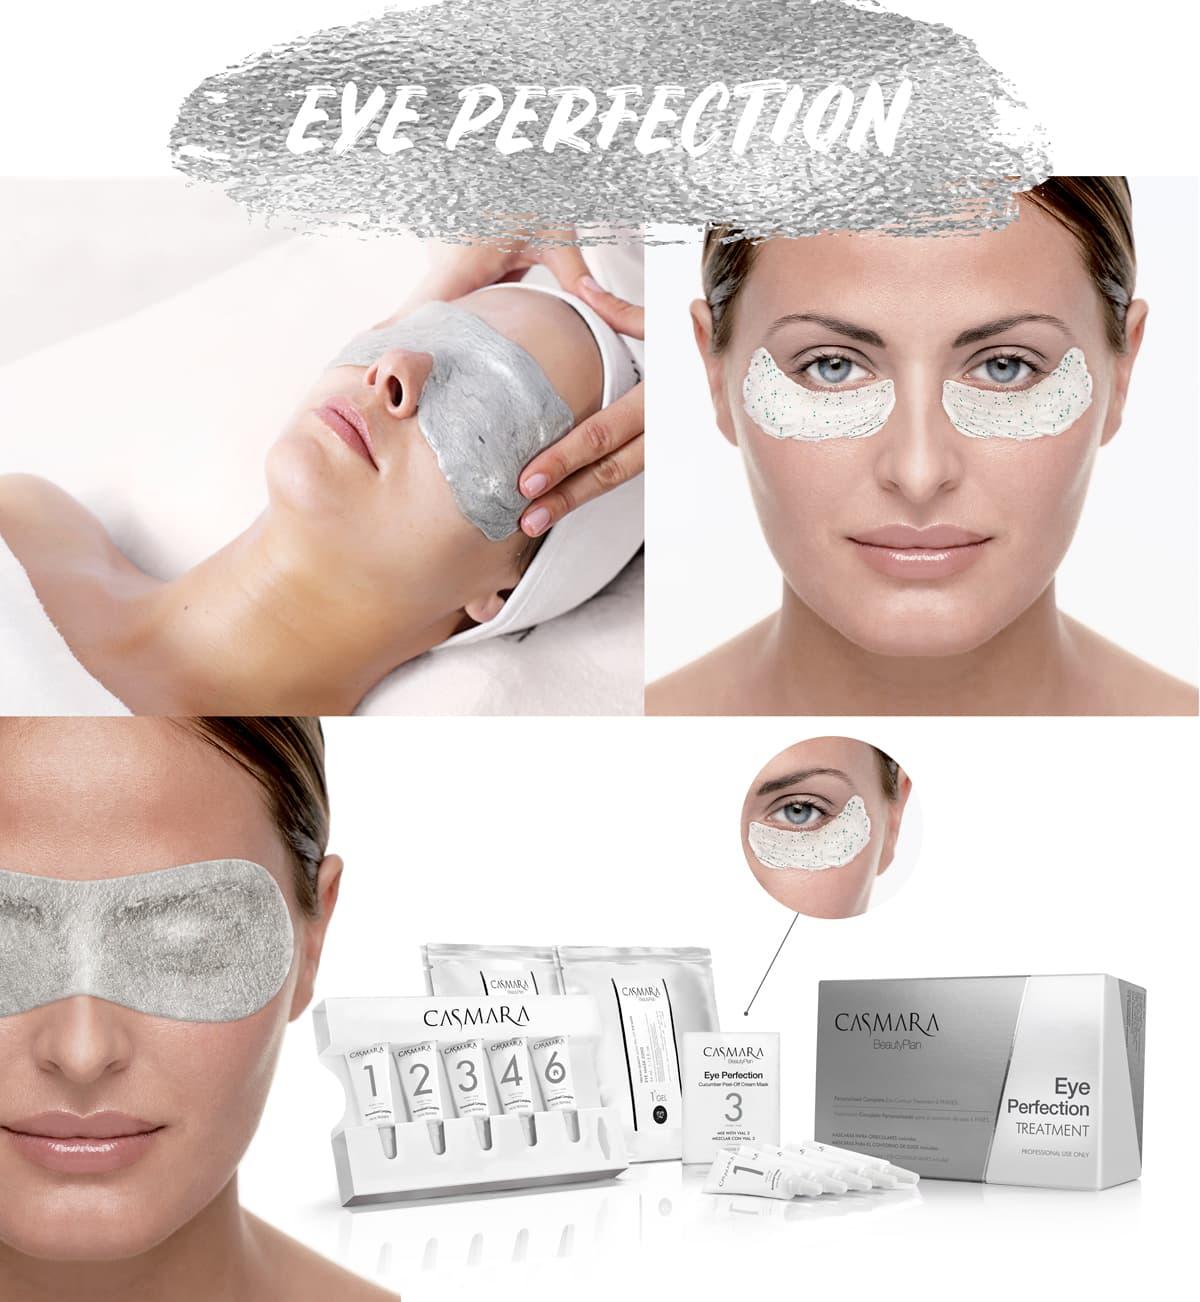 EYE-PERFECTION-CASMARA-UK